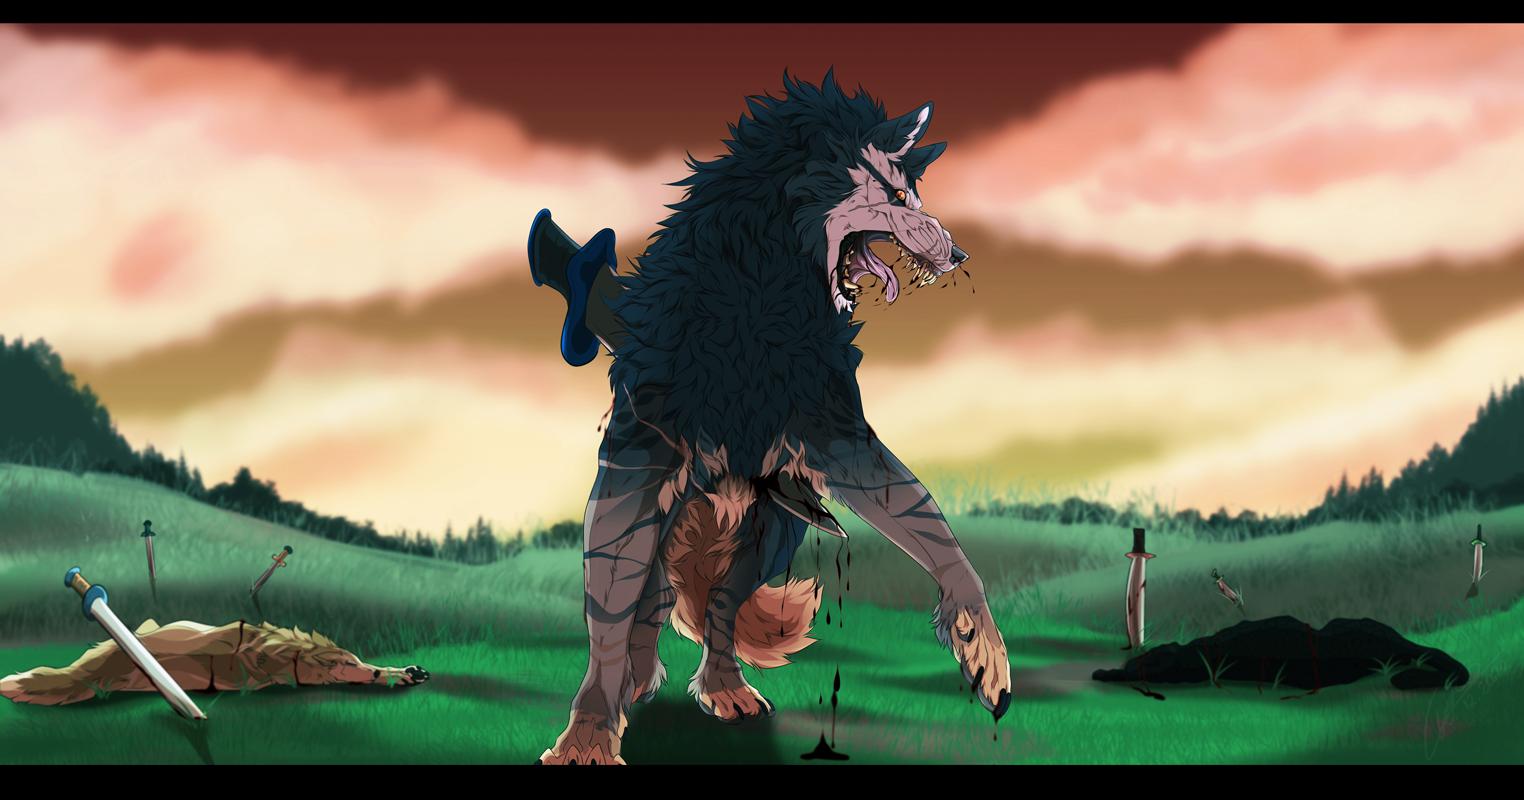 Tala ~ The Last Warrior